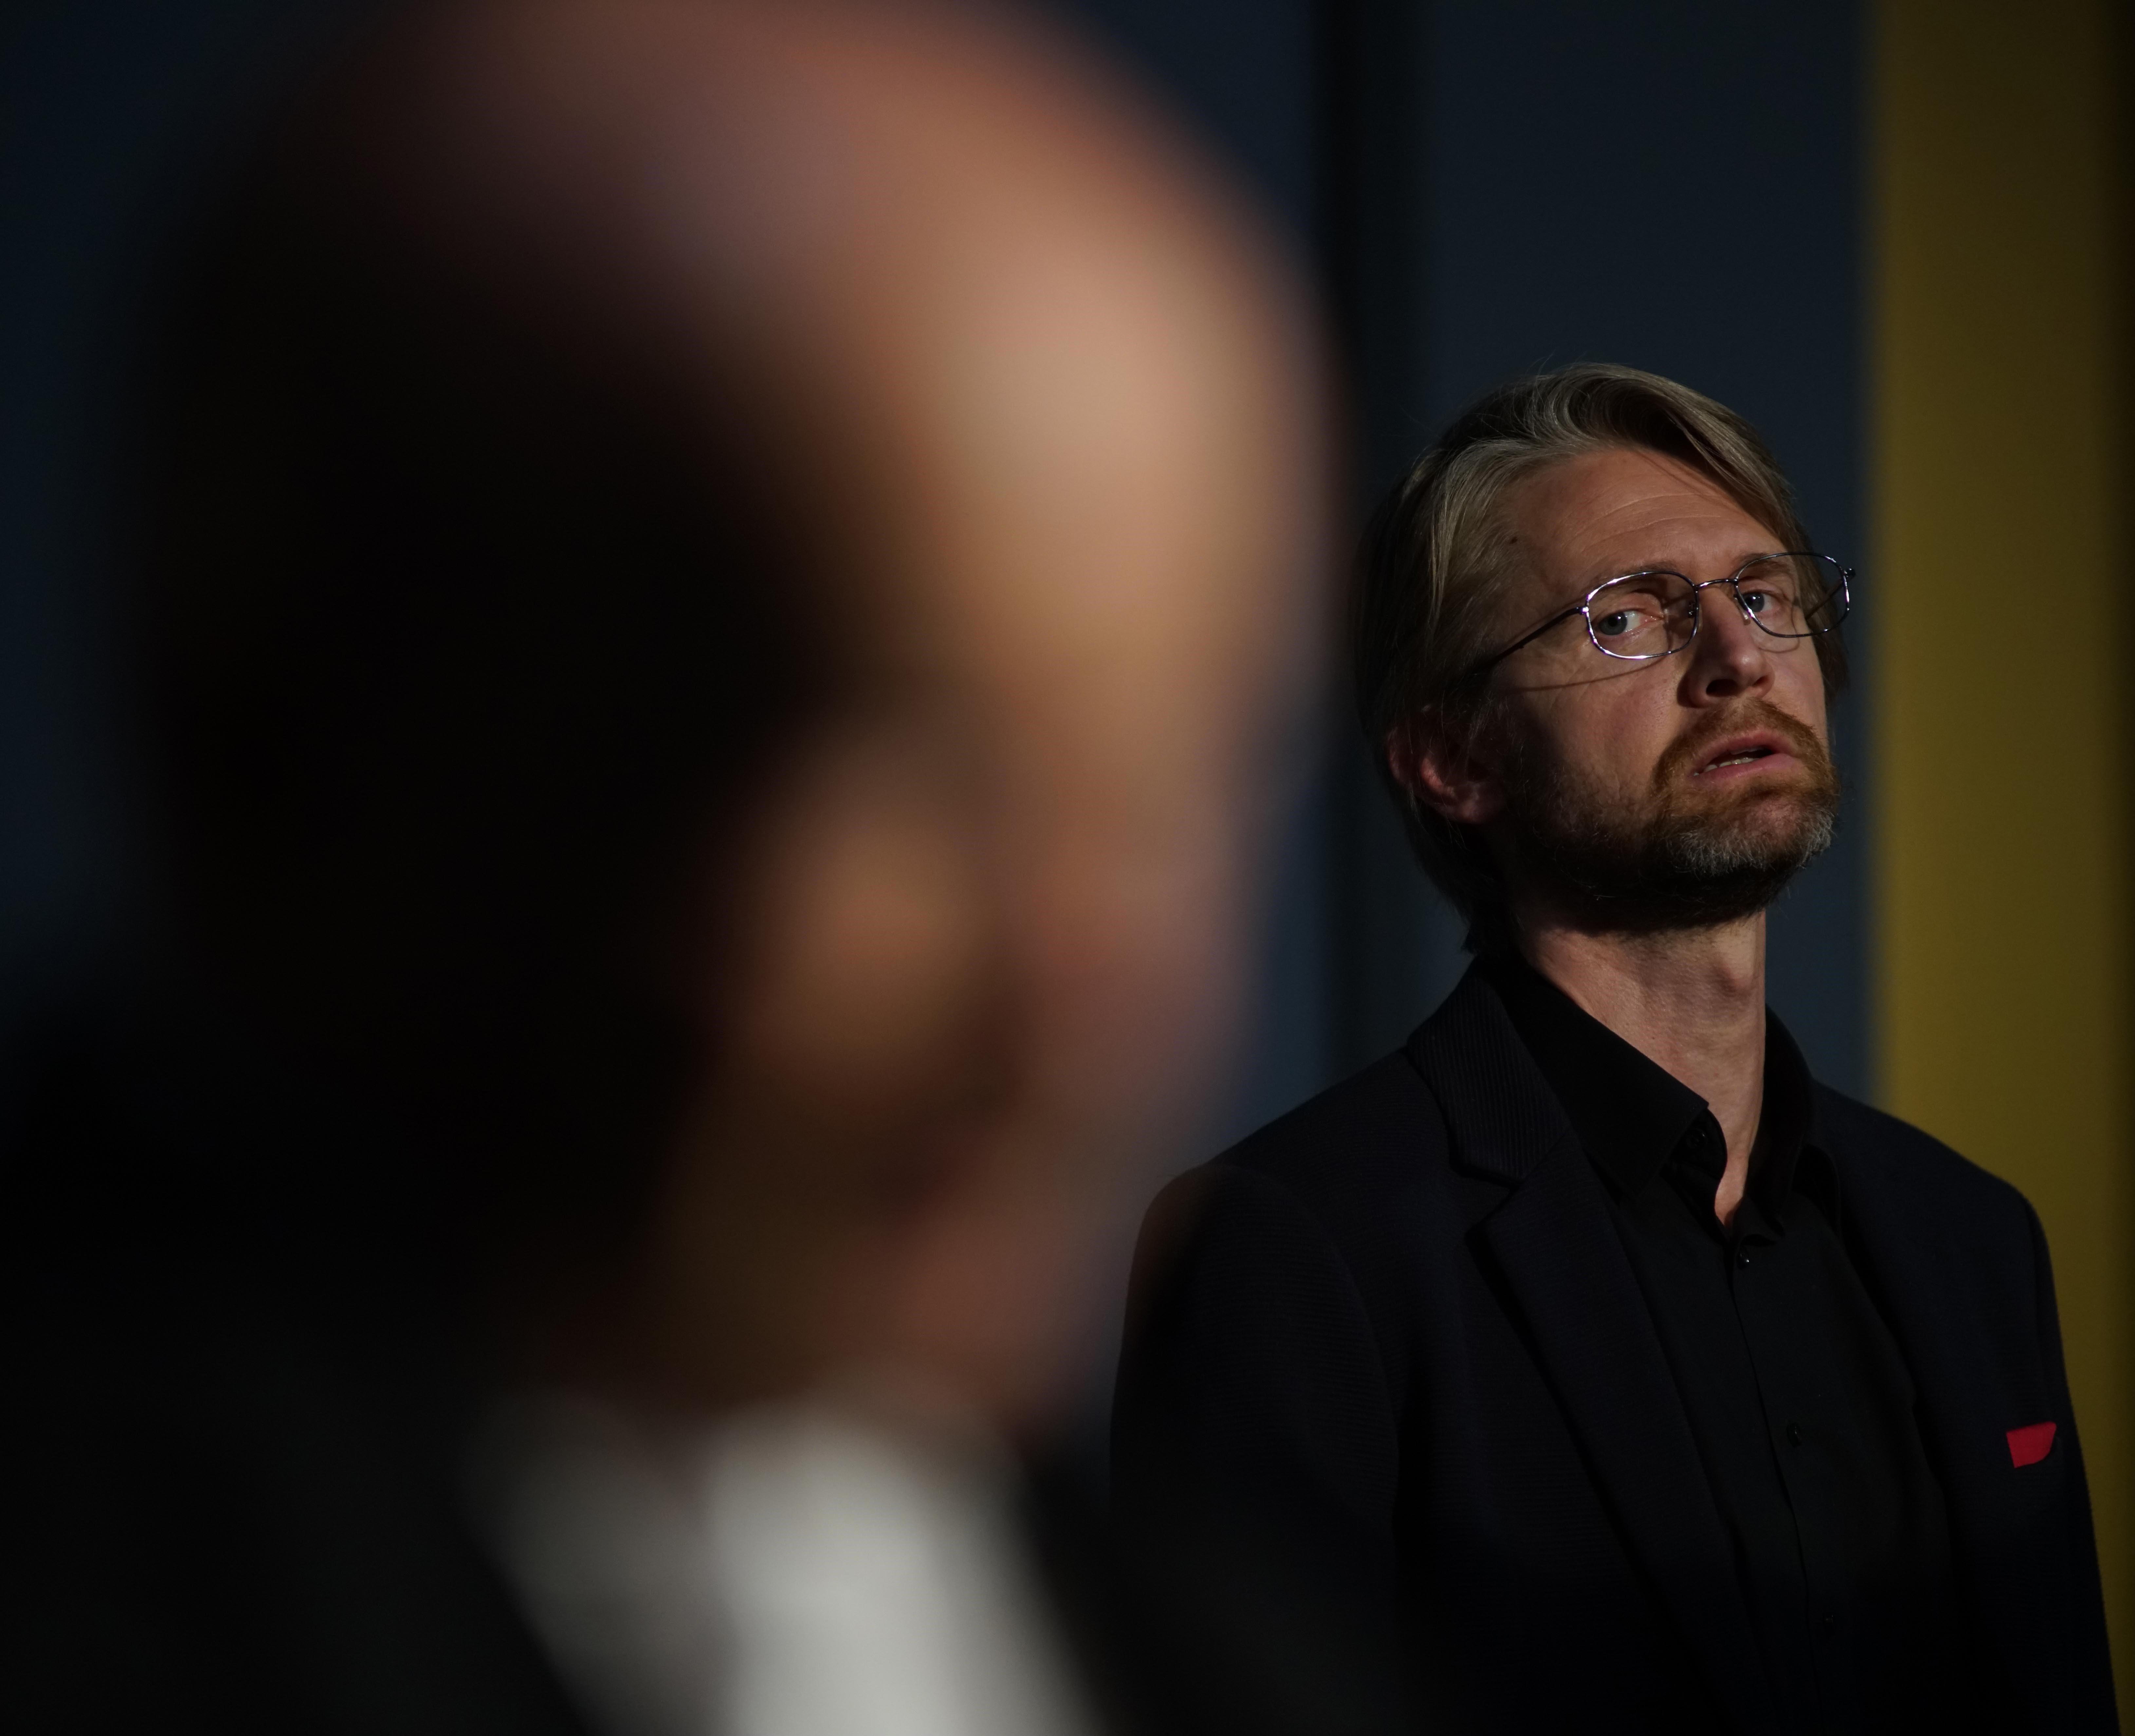 Thomas Peters in der Titelrolle am Hessischen Staatstheater Wiesbaden